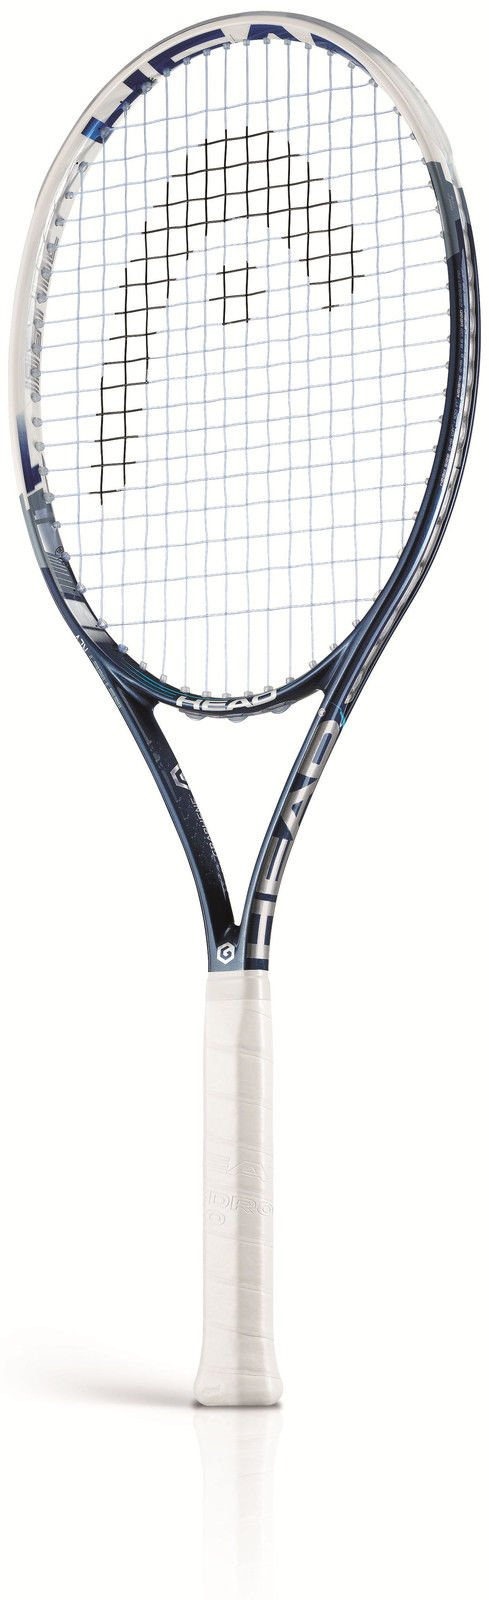 Head Graphene Instinct Rev Tennis Racquet 4-1/4 by HEAD (Image #1)